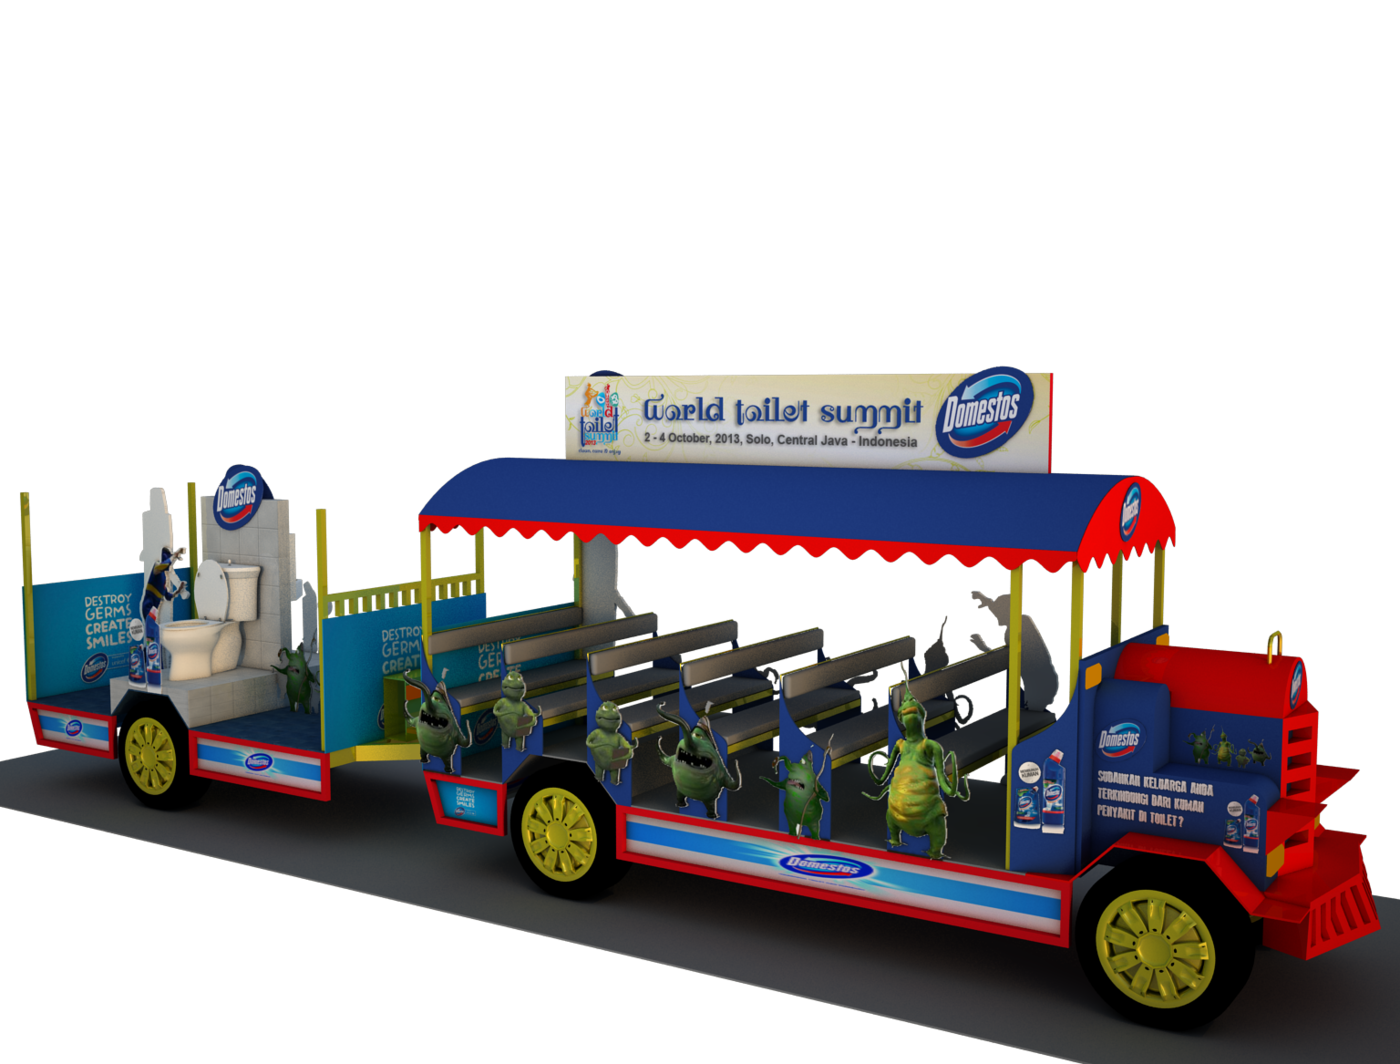 Domestos carnaval truck @ World Toilet Summit 2013 by BAGUS